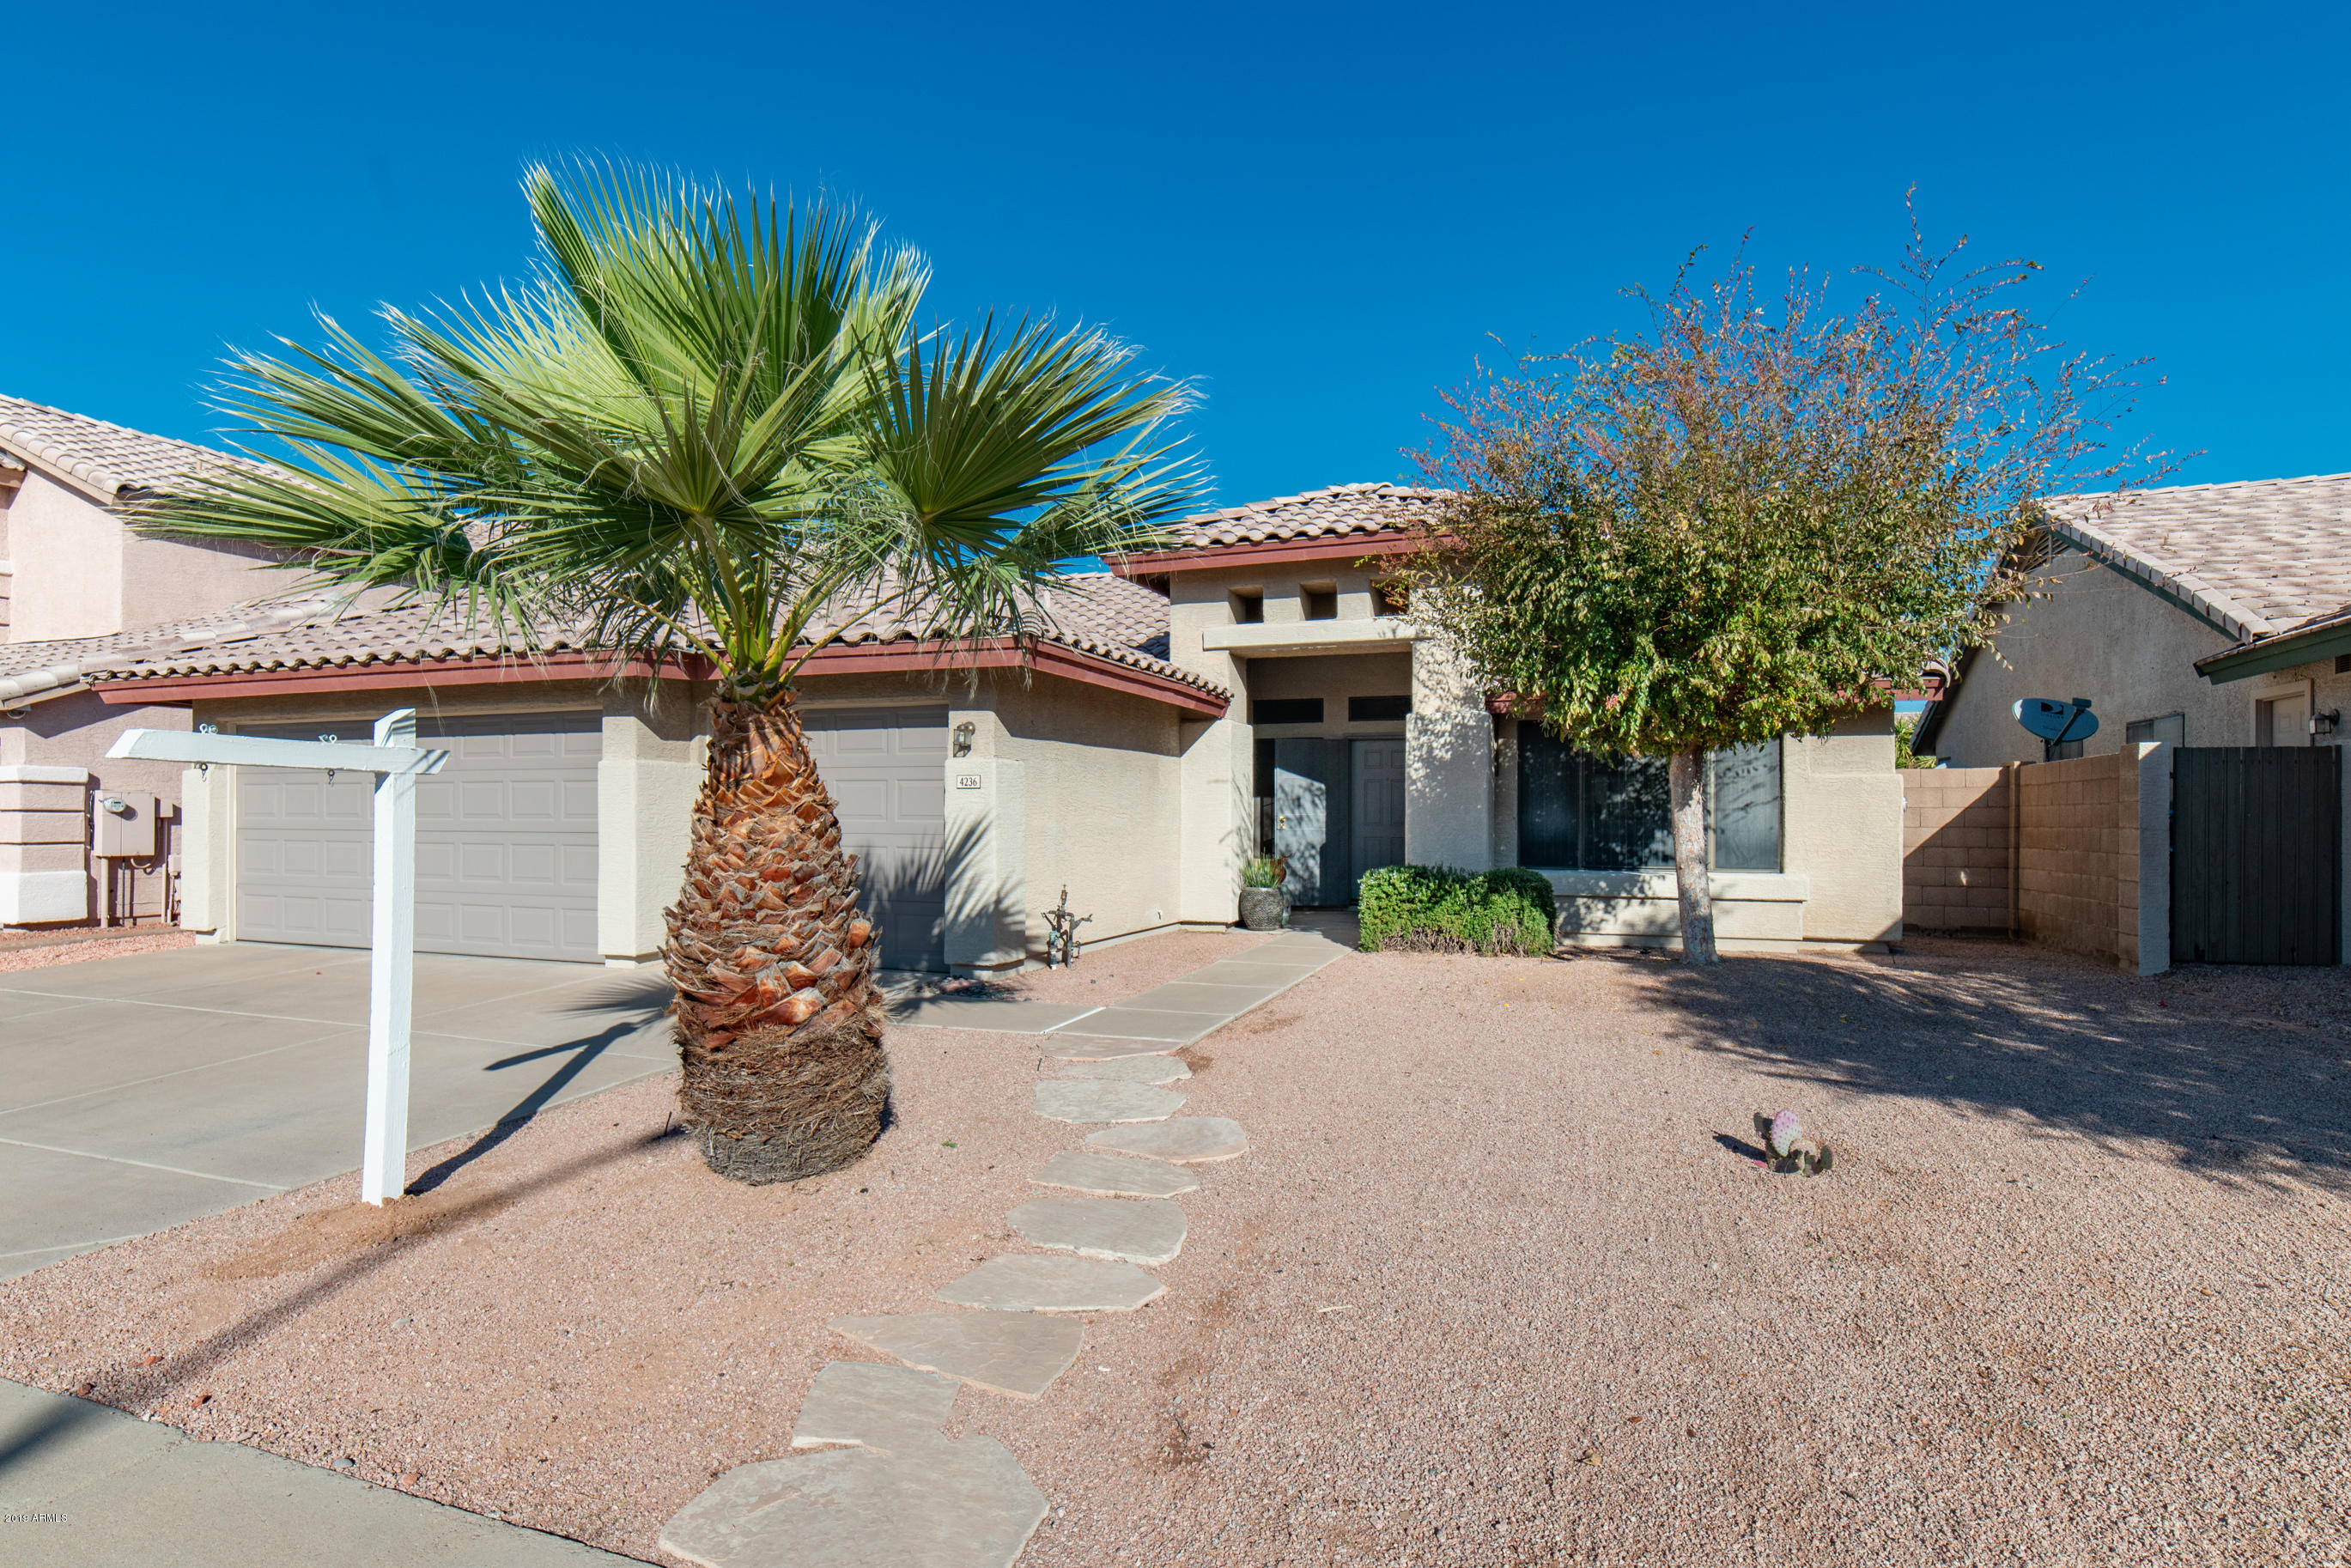 Photo of 4236 E MEADOW Drive, Phoenix, AZ 85032